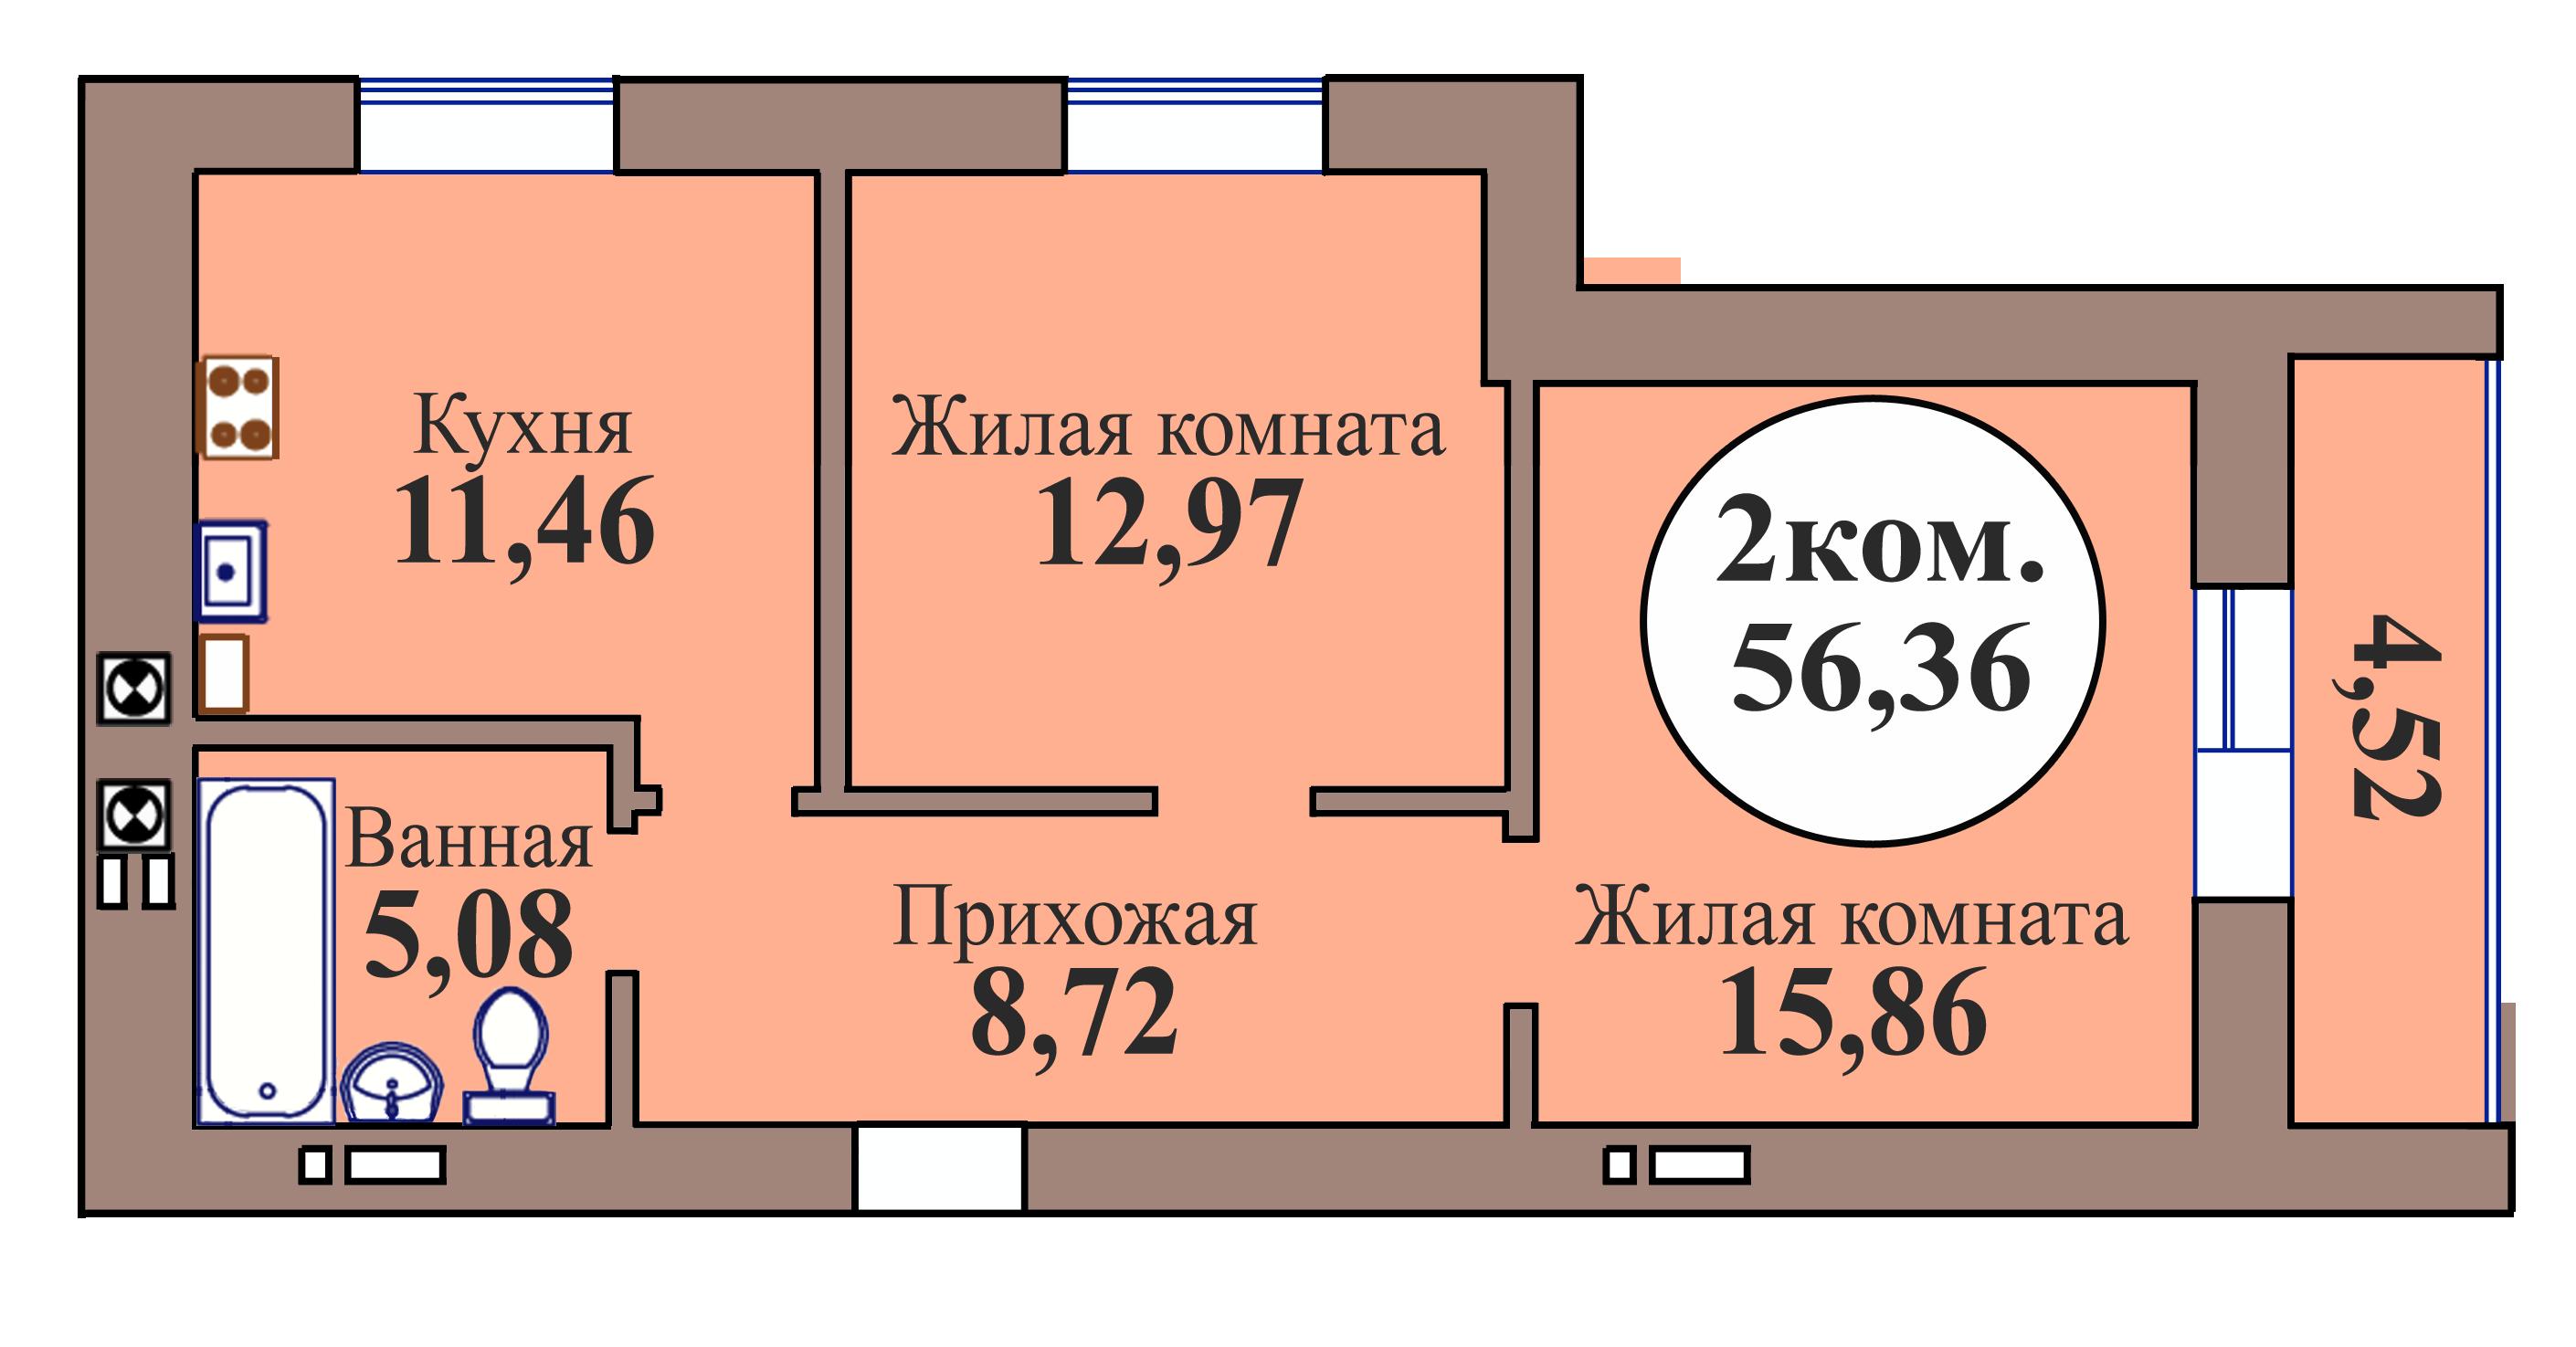 2-комн. кв. по пер. Калининградский, 5 кв. 98 в Калининграде